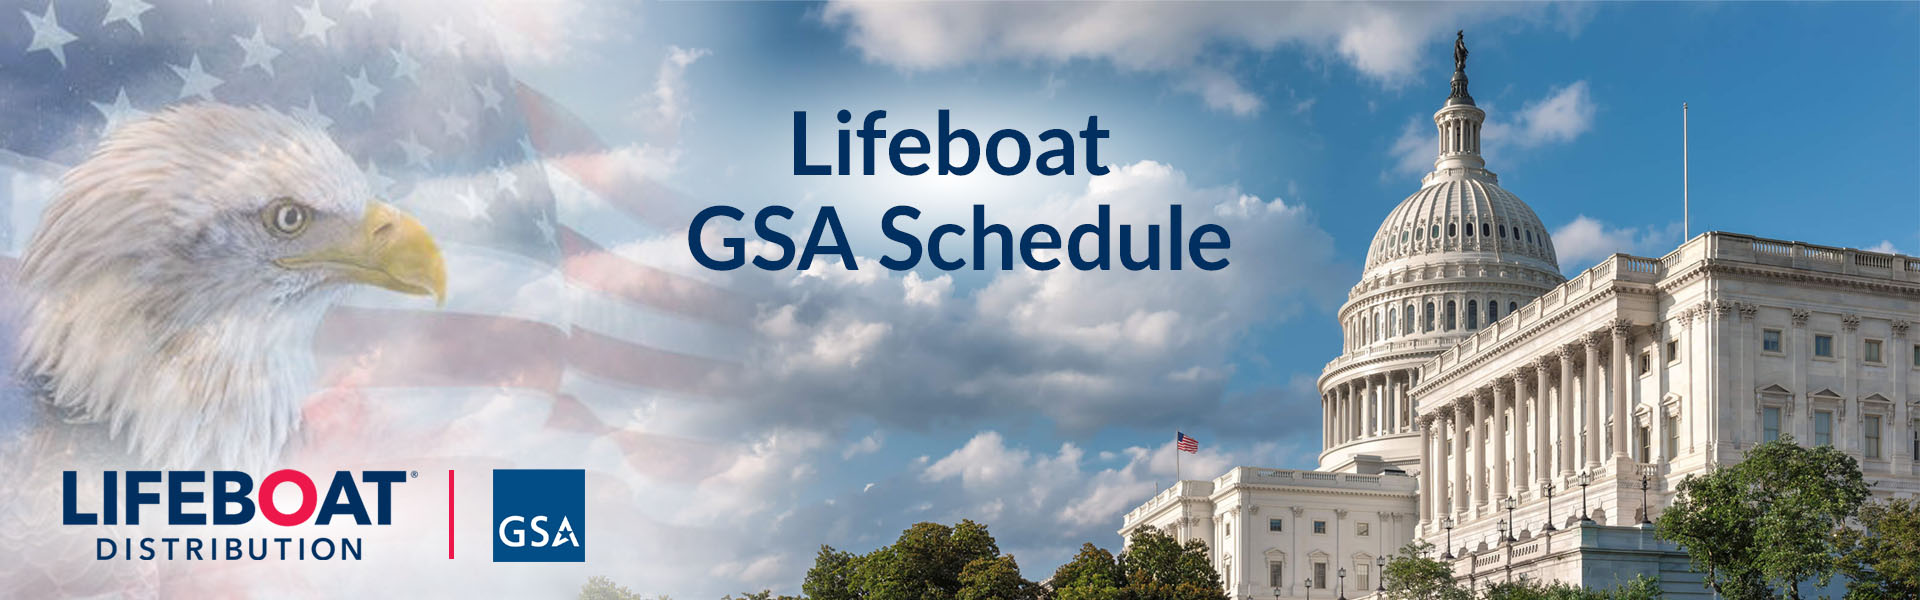 Lifeboat GSA banner